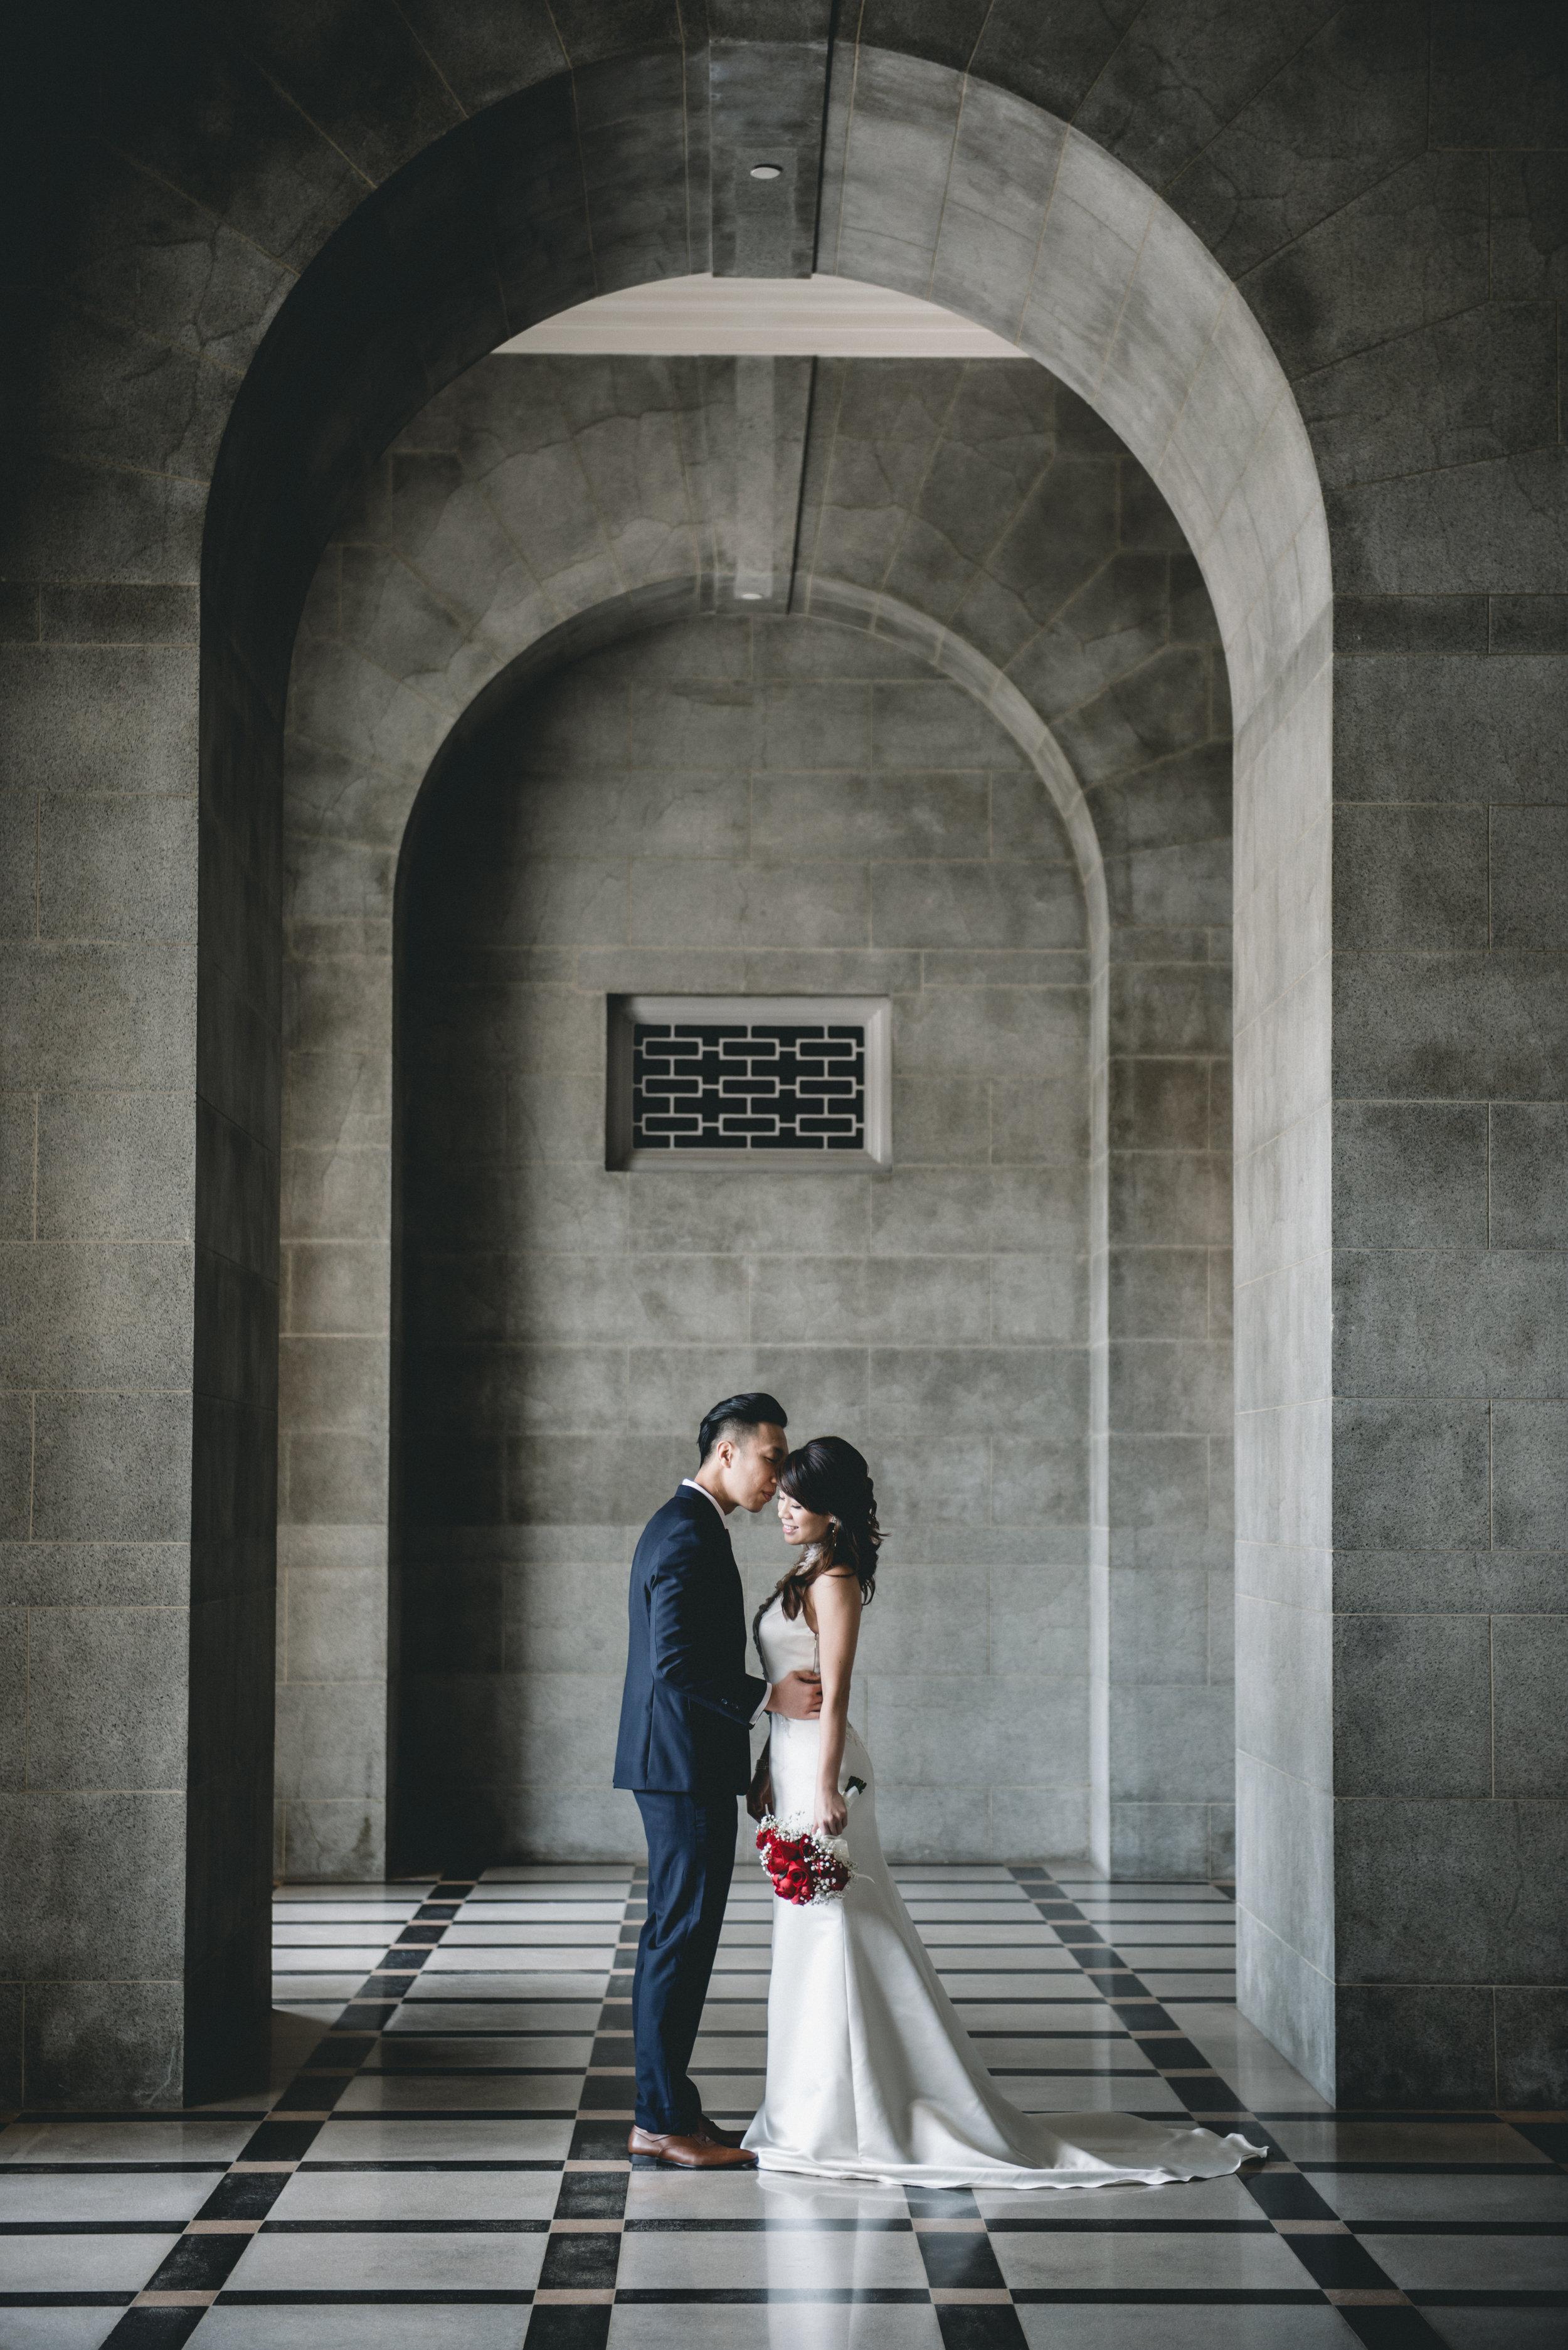 Wedding National Gallery 23b.JPG